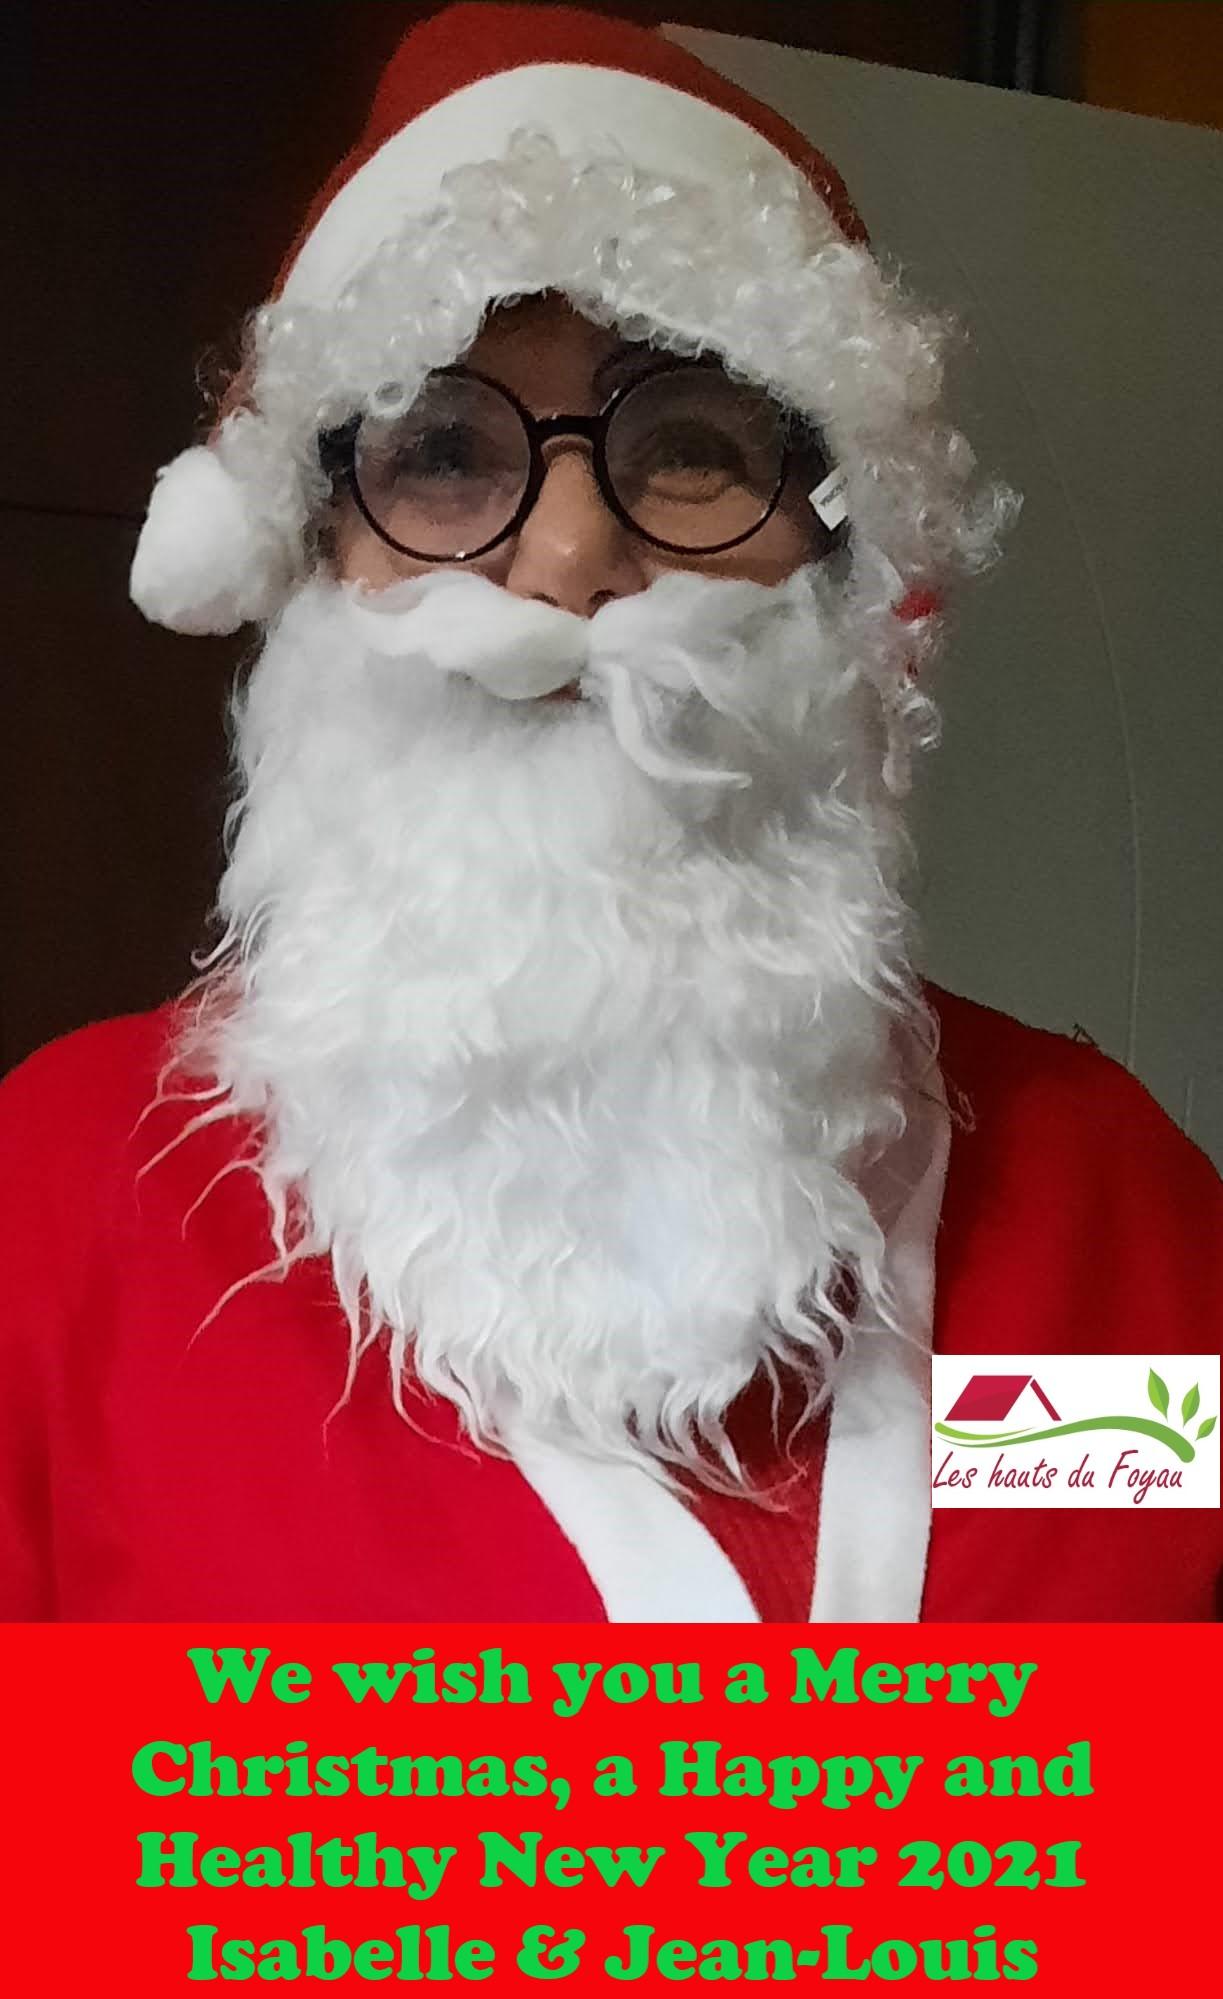 Joyeux Noël et Bonne Année 2021 - Merry Christmas and Happy New Year 2021